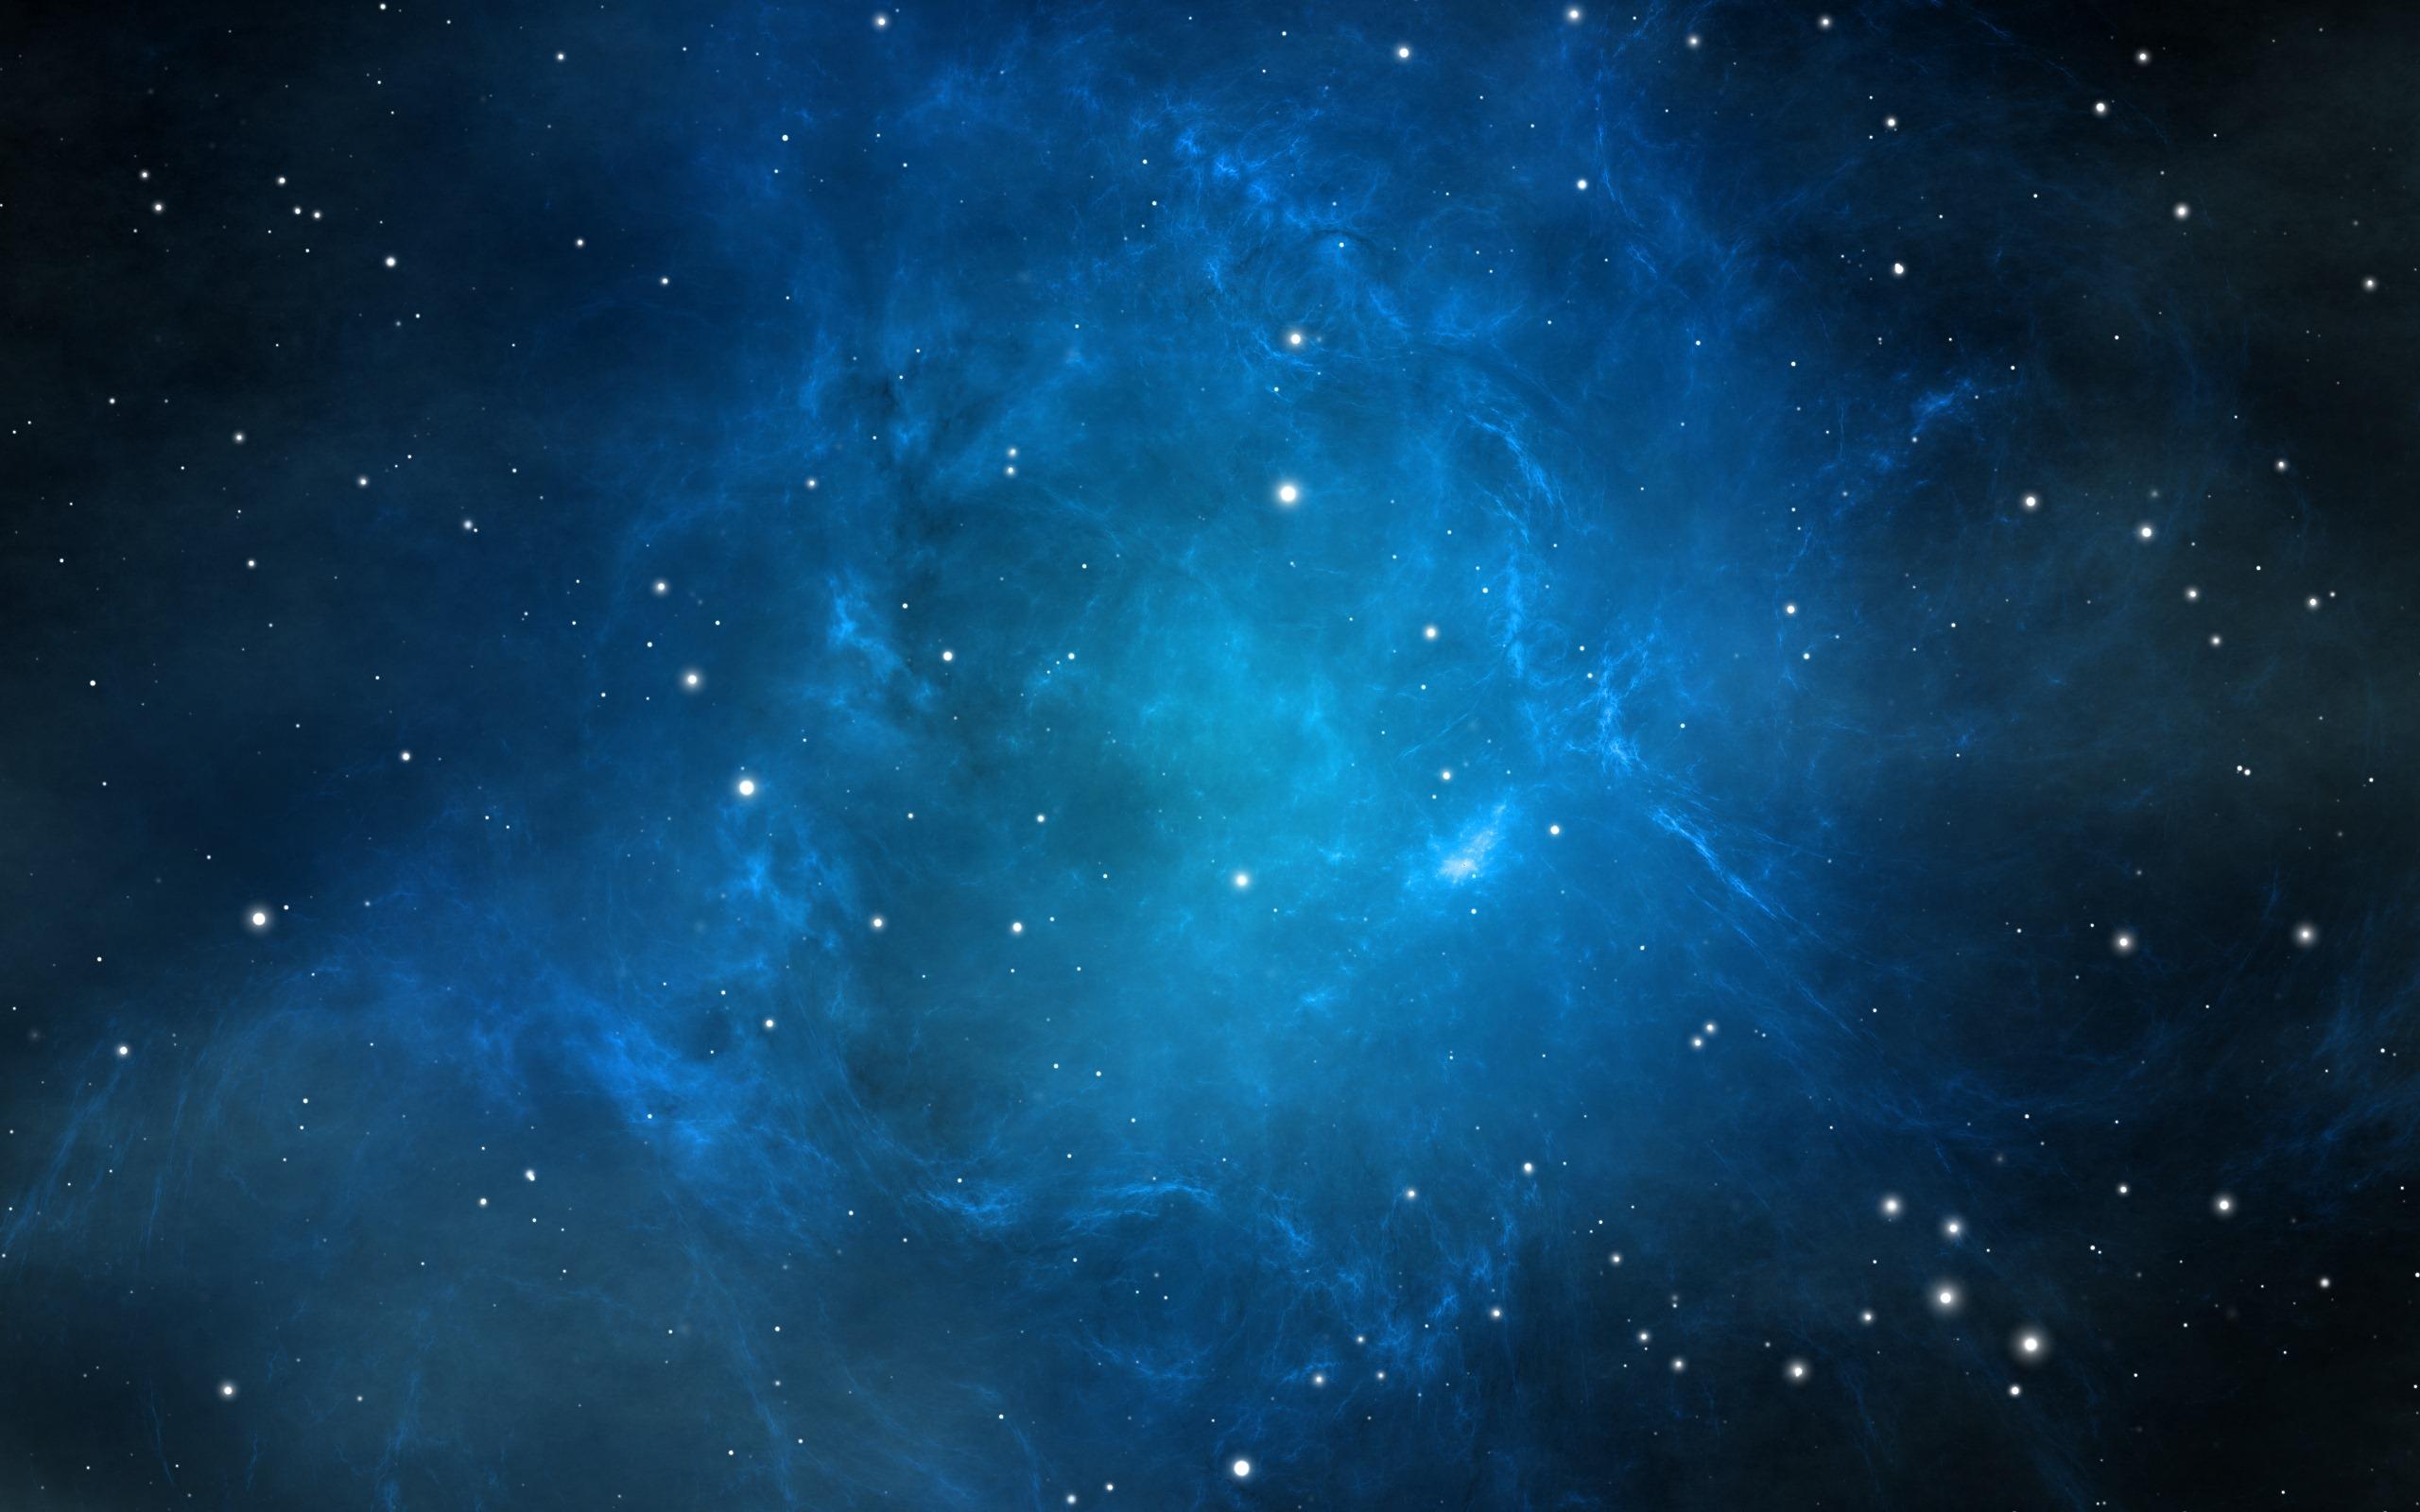 Stars In Blue Background Hd Wallpaper Wallpaper List 2560x1600